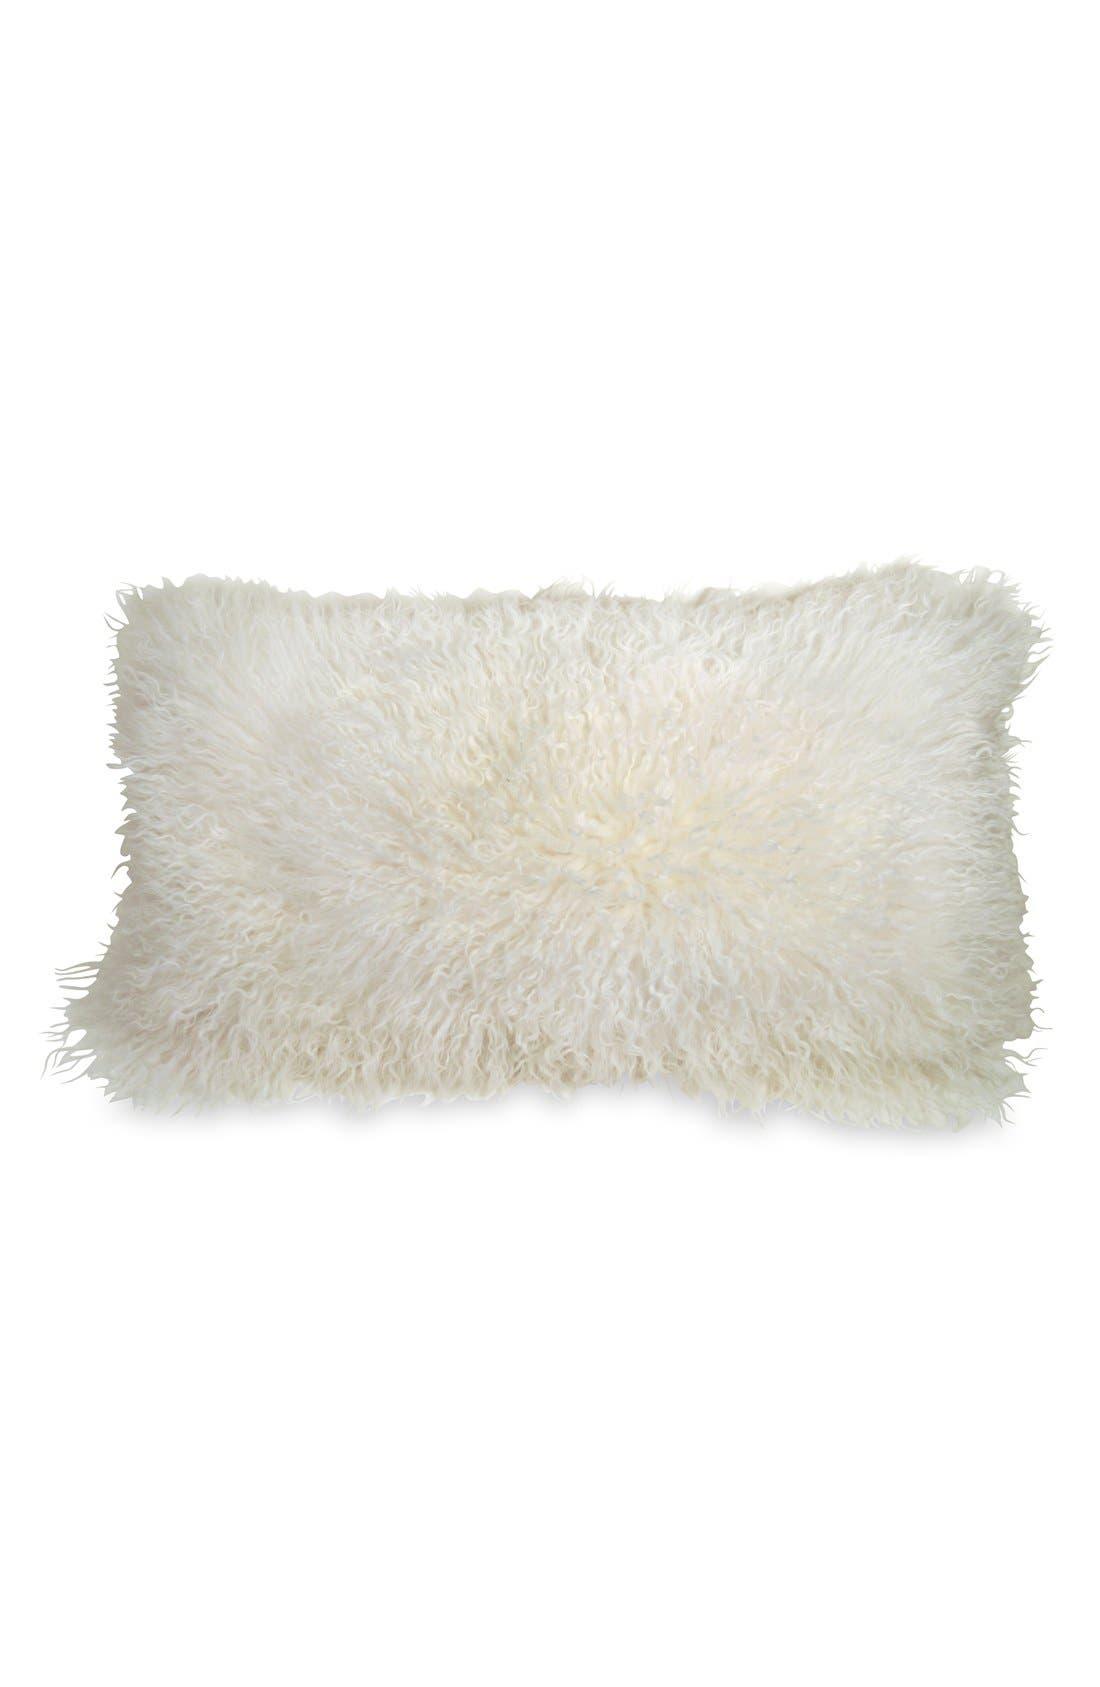 Main Image - Donna Karan Collection Moonscape Flokati Genuine Sheepskin Pillow